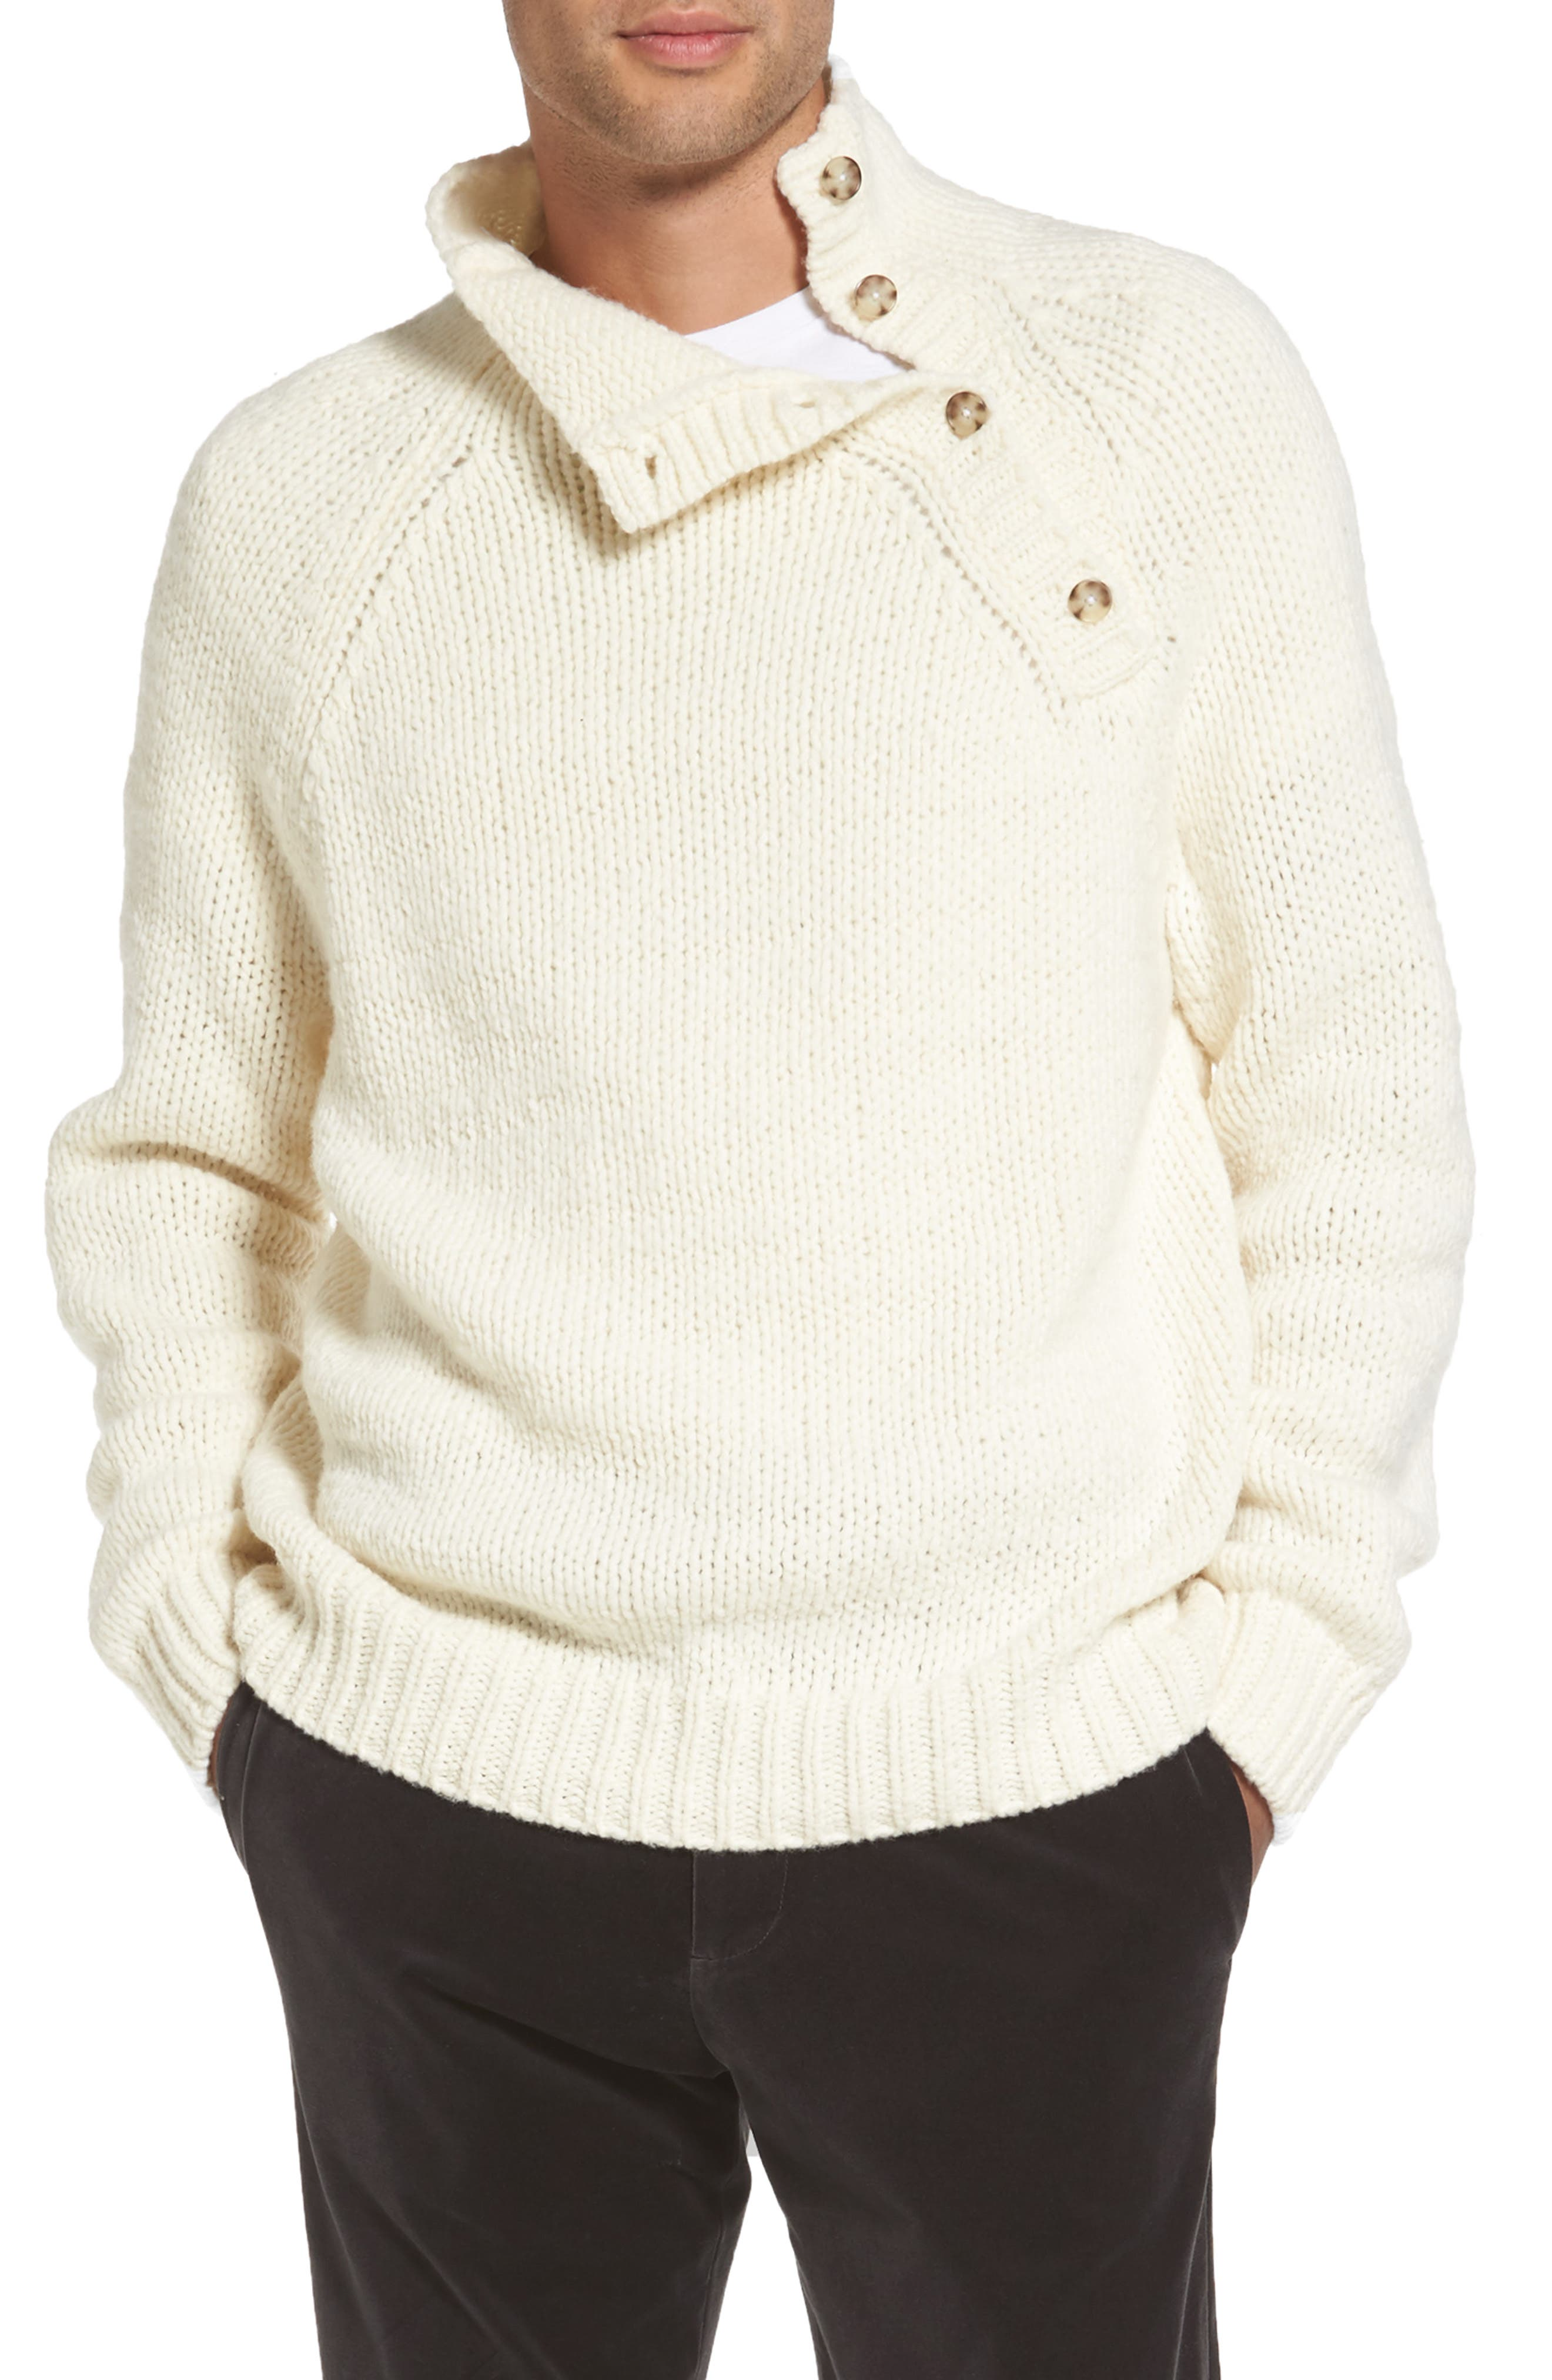 Alternate Image 1 Selected - Vince Side Button Mock Neck Sweater